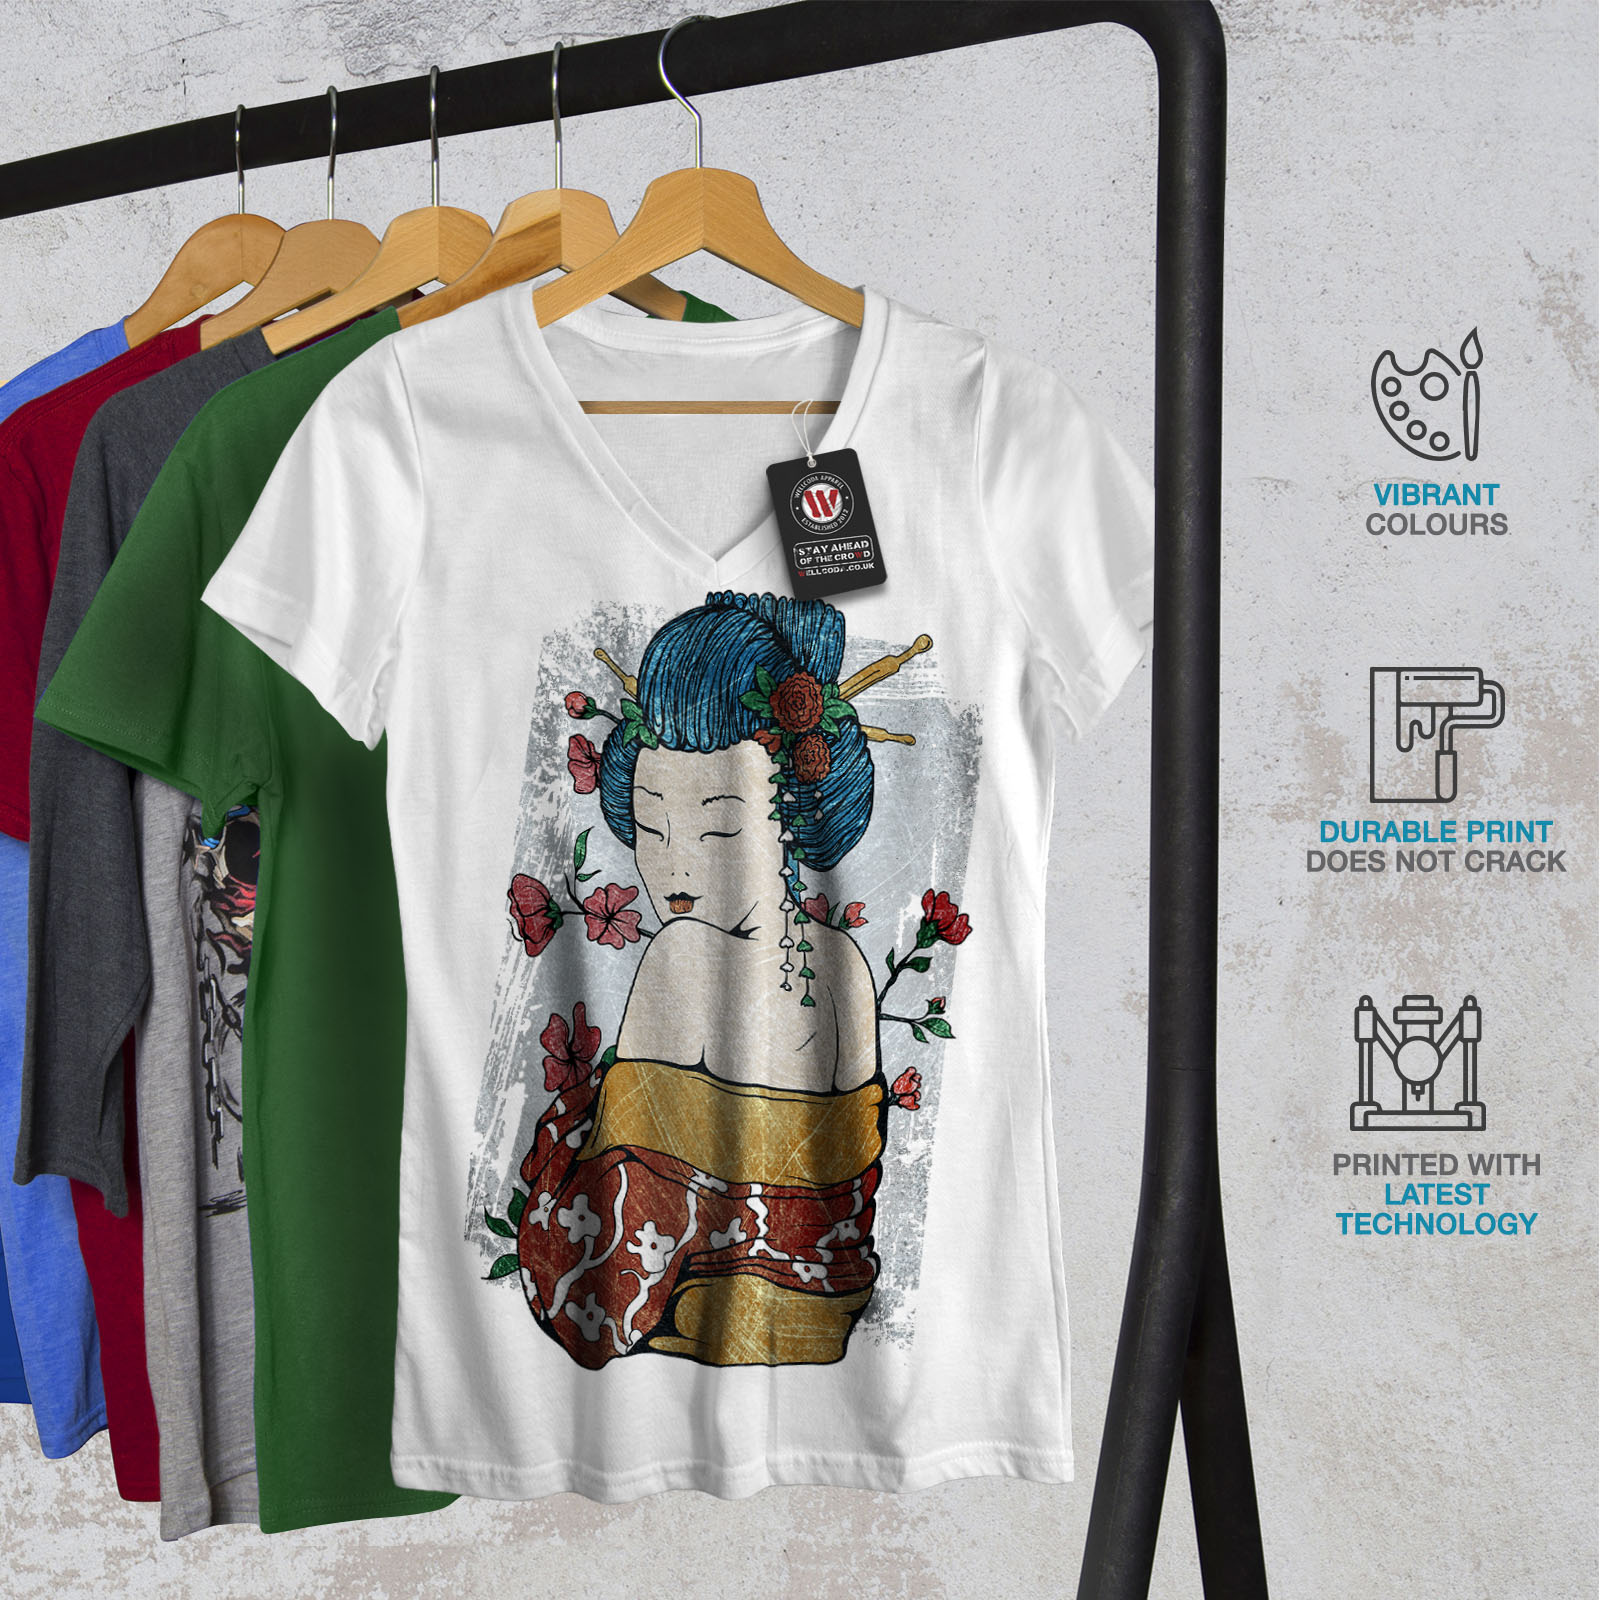 Wellcoda-Japan-Woman-Beauty-Womens-V-Neck-T-shirt-Oriental-Graphic-Design-Tee thumbnail 8